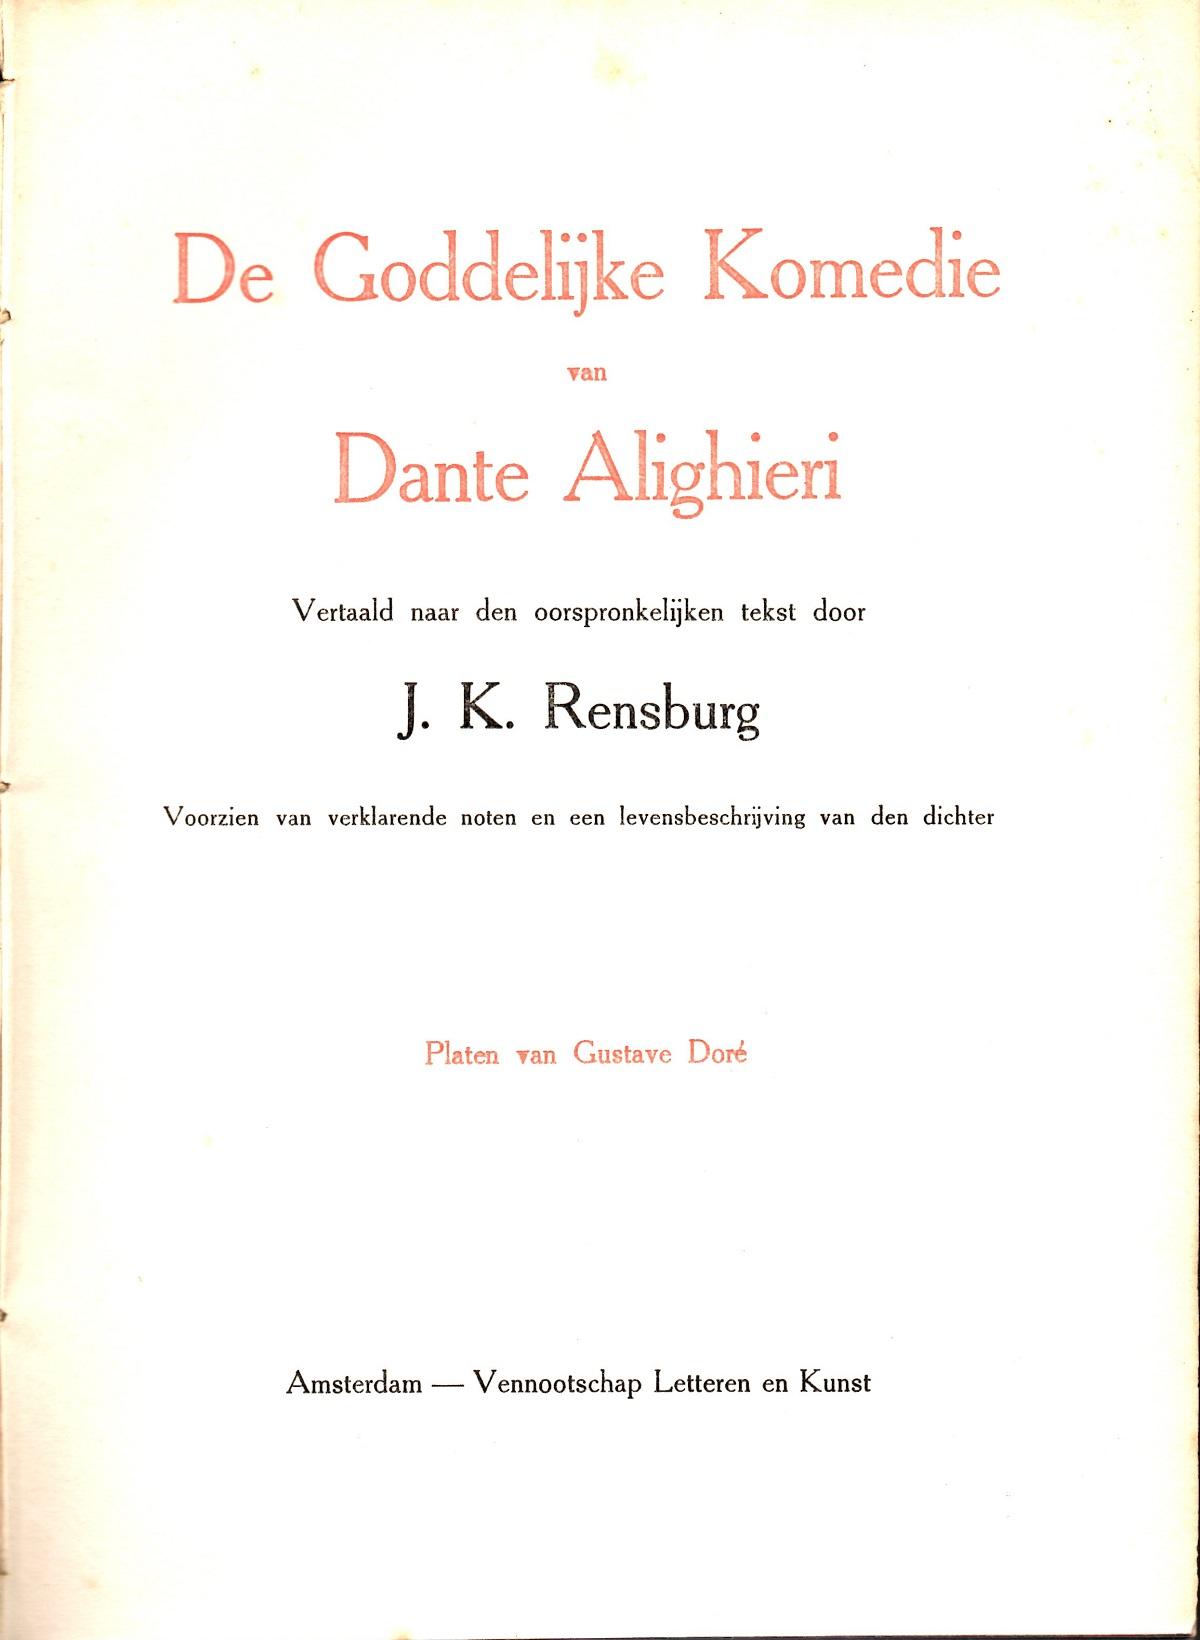 Rensburg – 1906